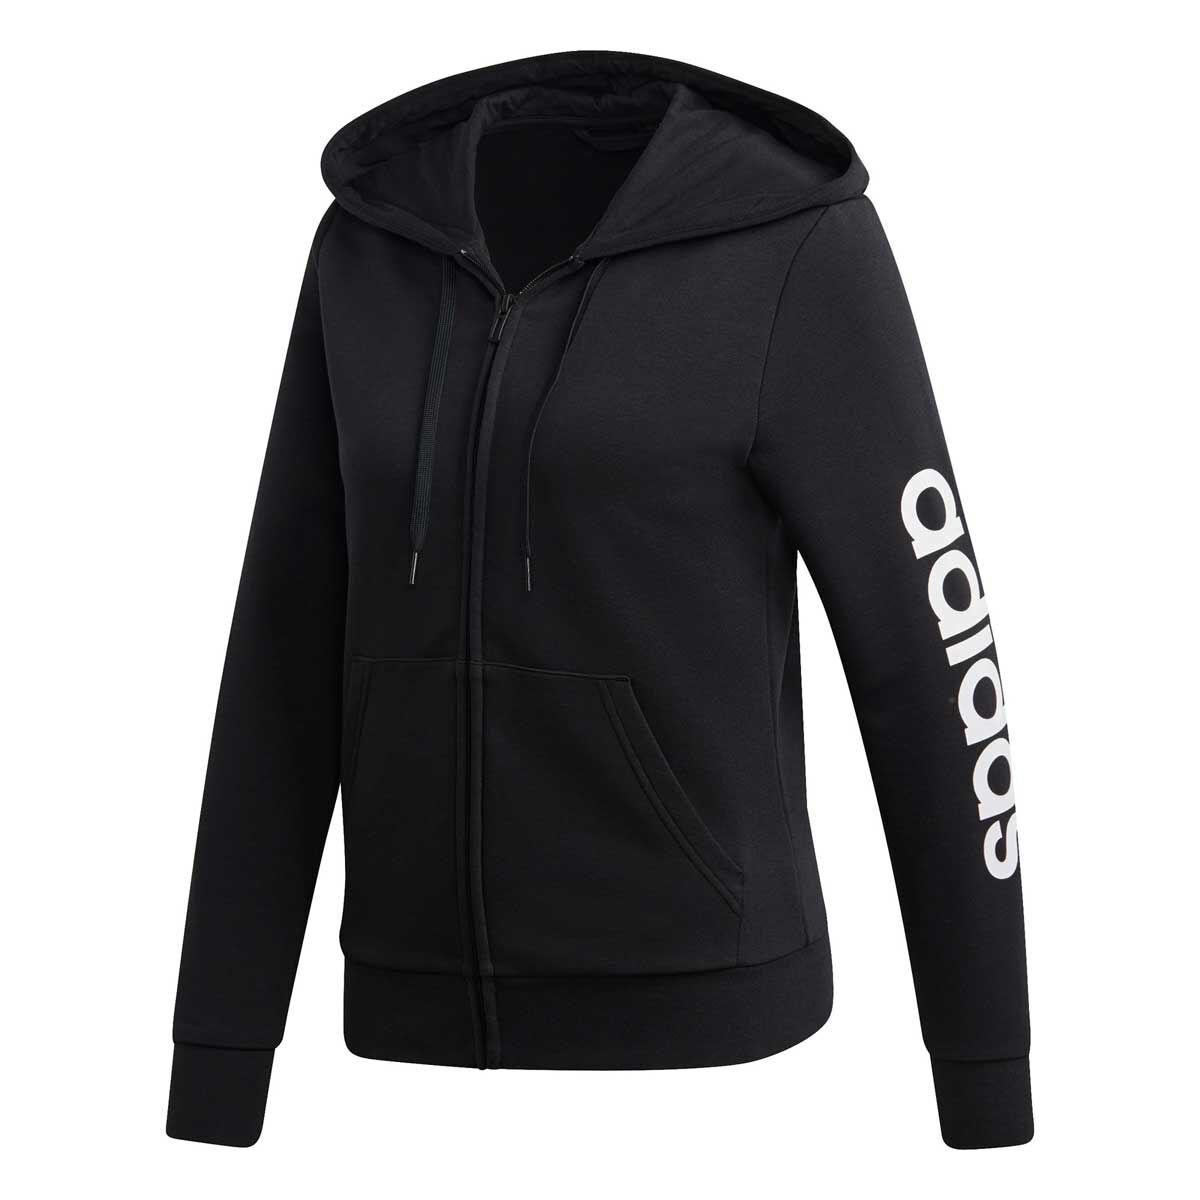 Cheap Womens Jackets & Hoodies Clothing rebel  free shipping